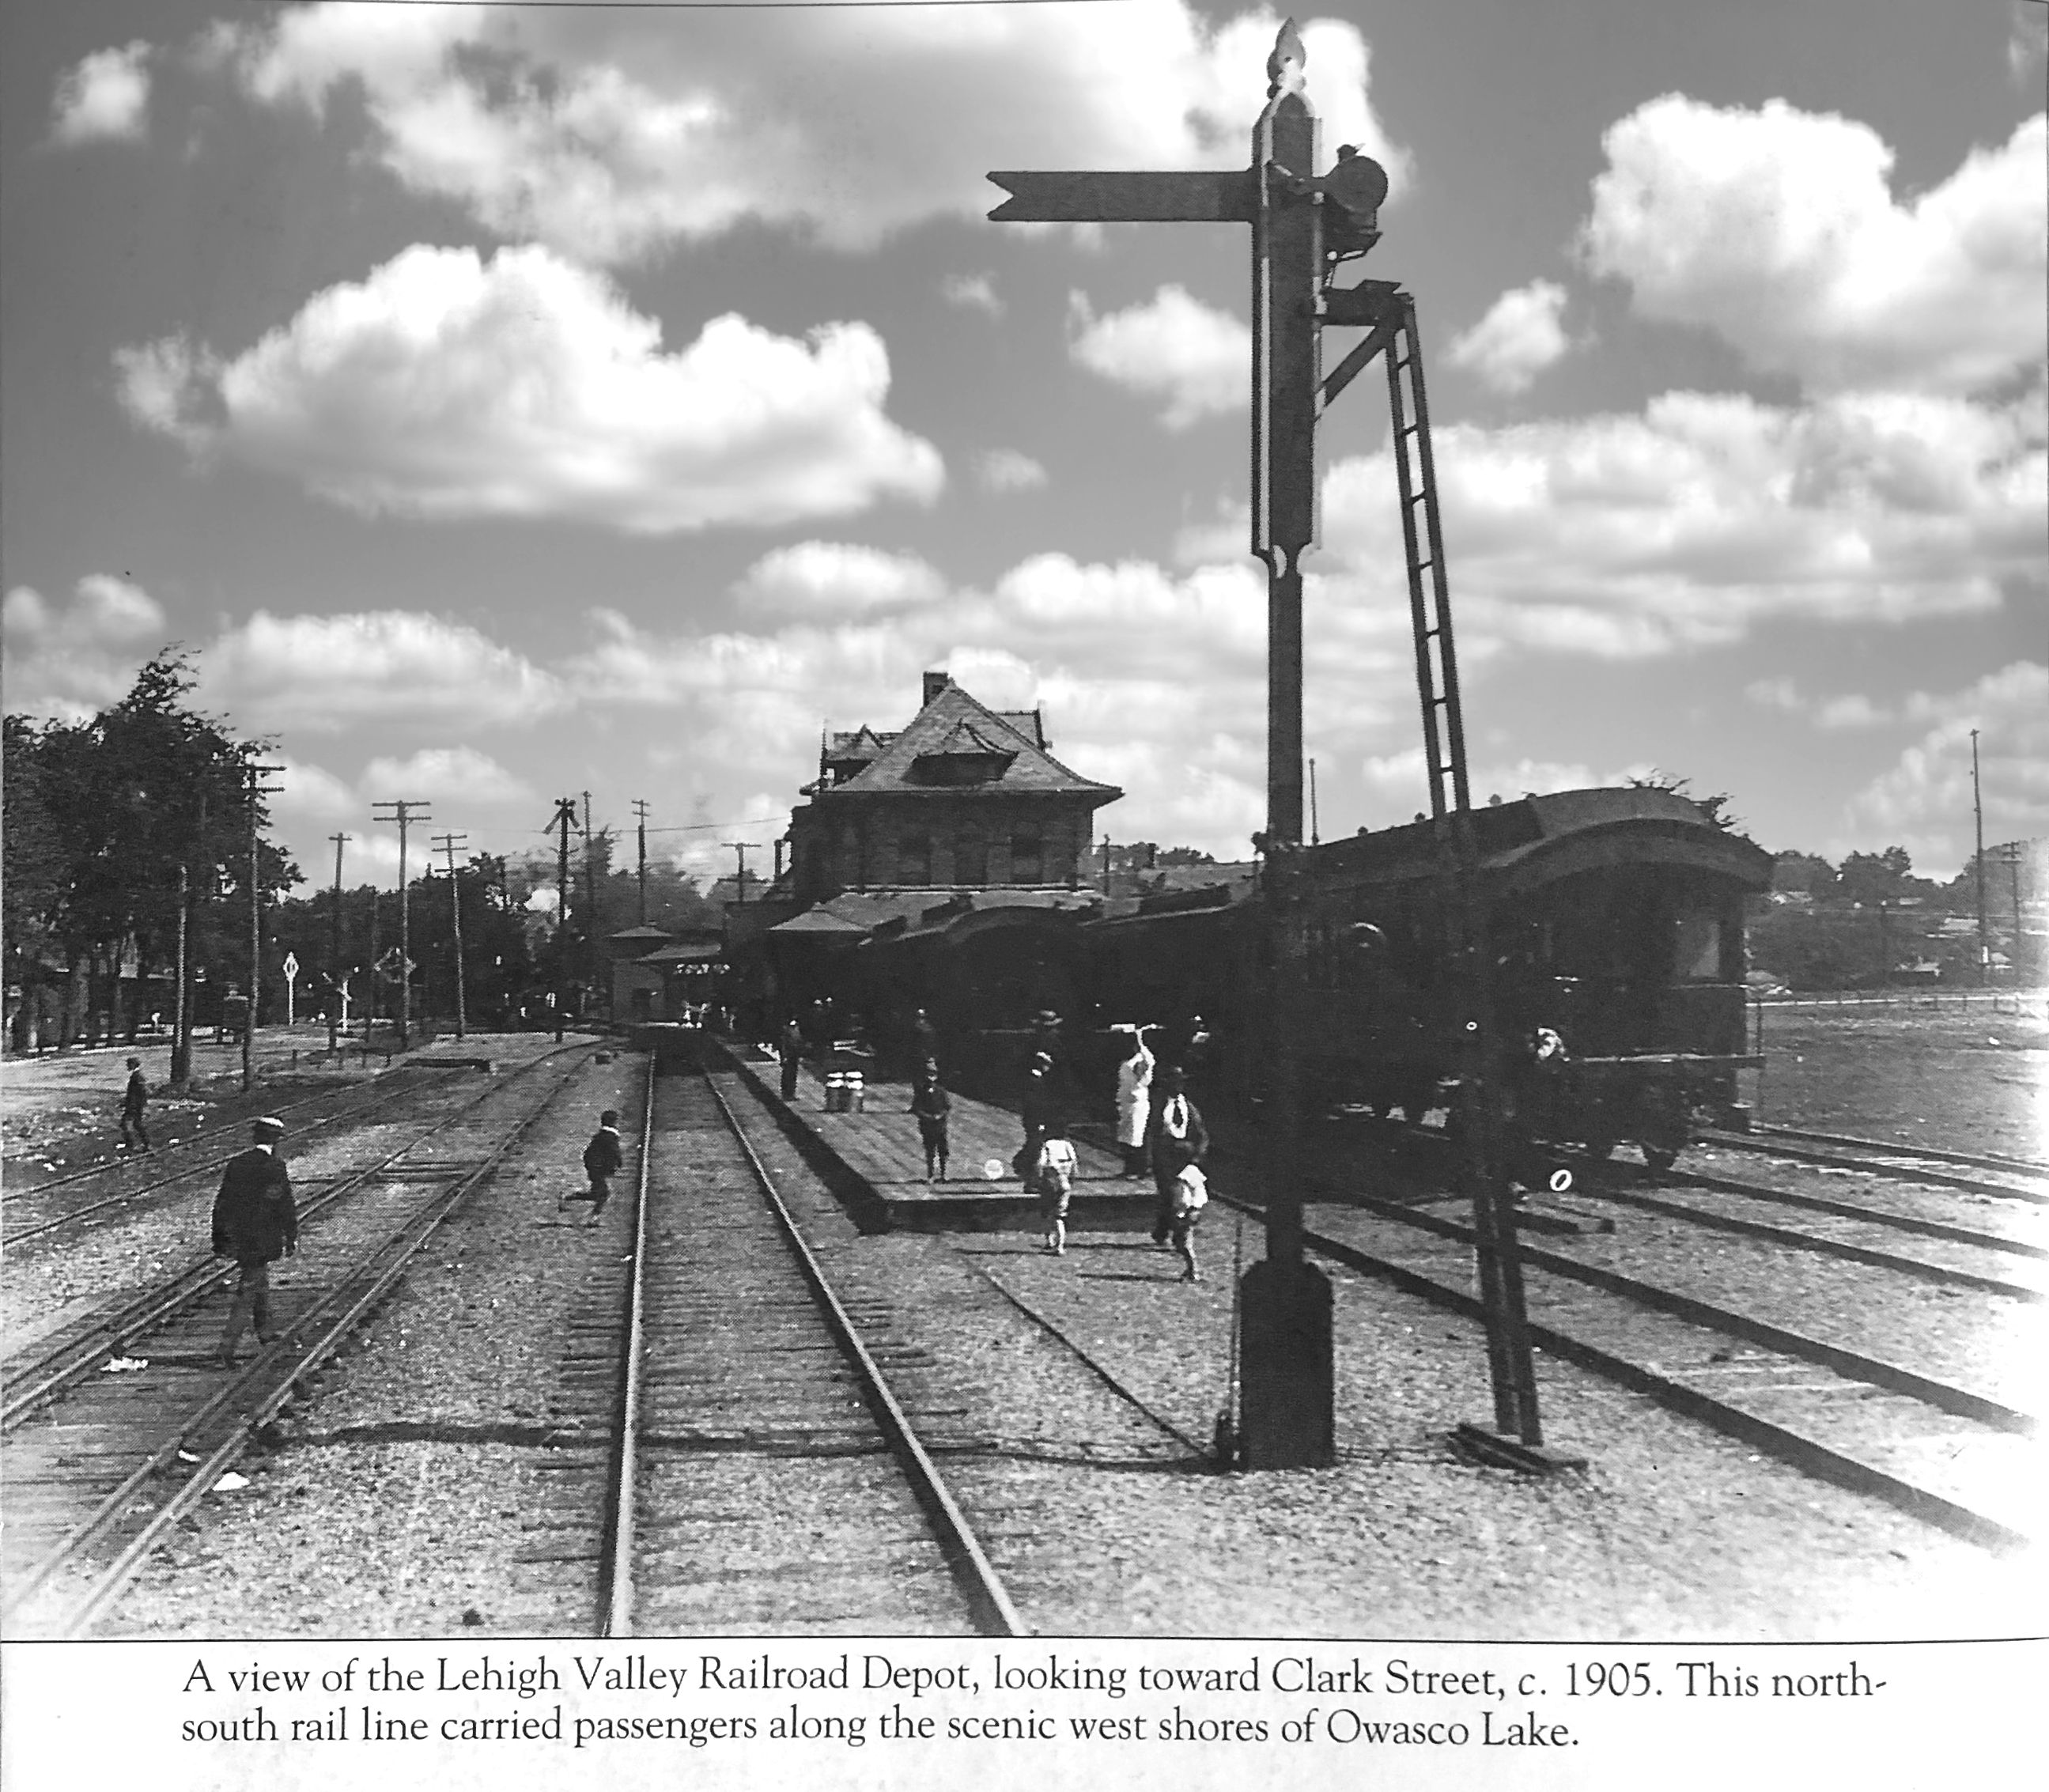 Lehigh Valley Christmas Station 2020 Lehigh Valley Station, Auburn, NY in 2020 | Lehigh valley, Lehigh